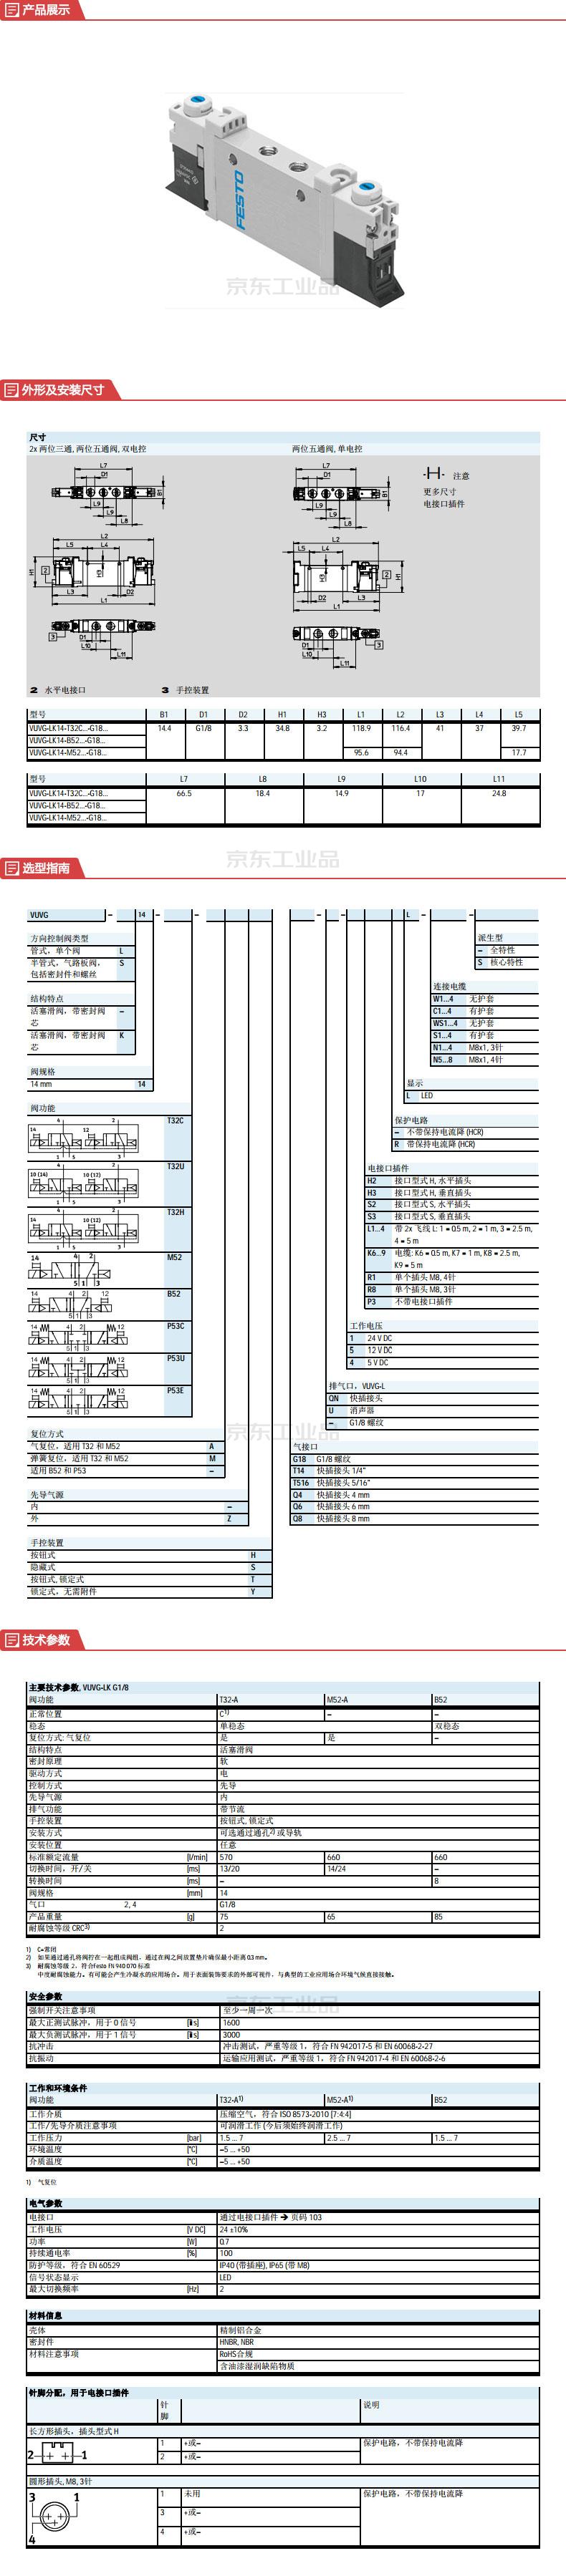 费斯托(FESTO) 电磁阀;VUVG-LK14-M52-AT-G18-1H2L-S